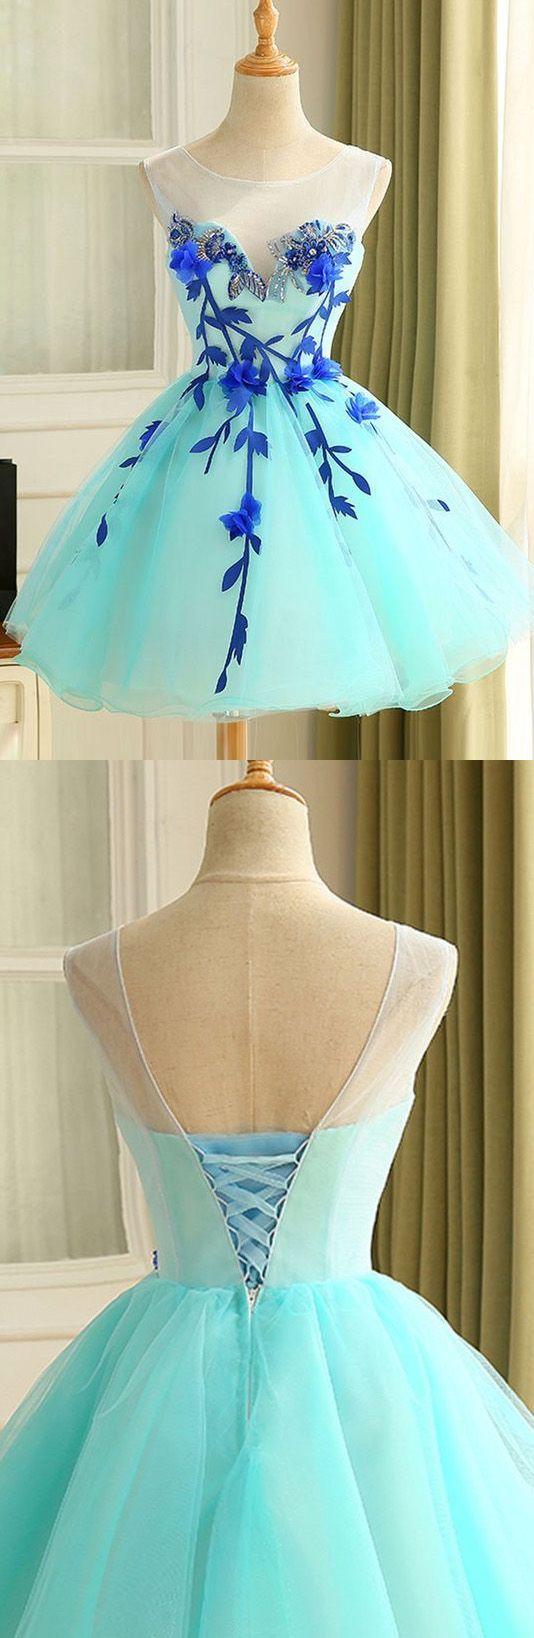 Sleeveless dresses short light blue prom homecoming dresses with